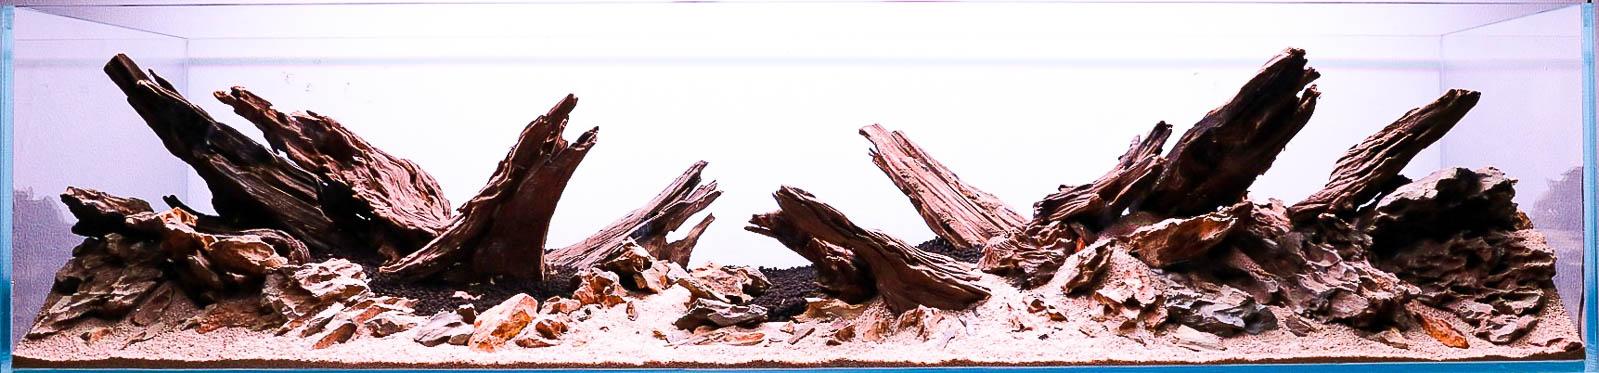 Wood Iwagumi mit Yati Holz von Fabian Beck